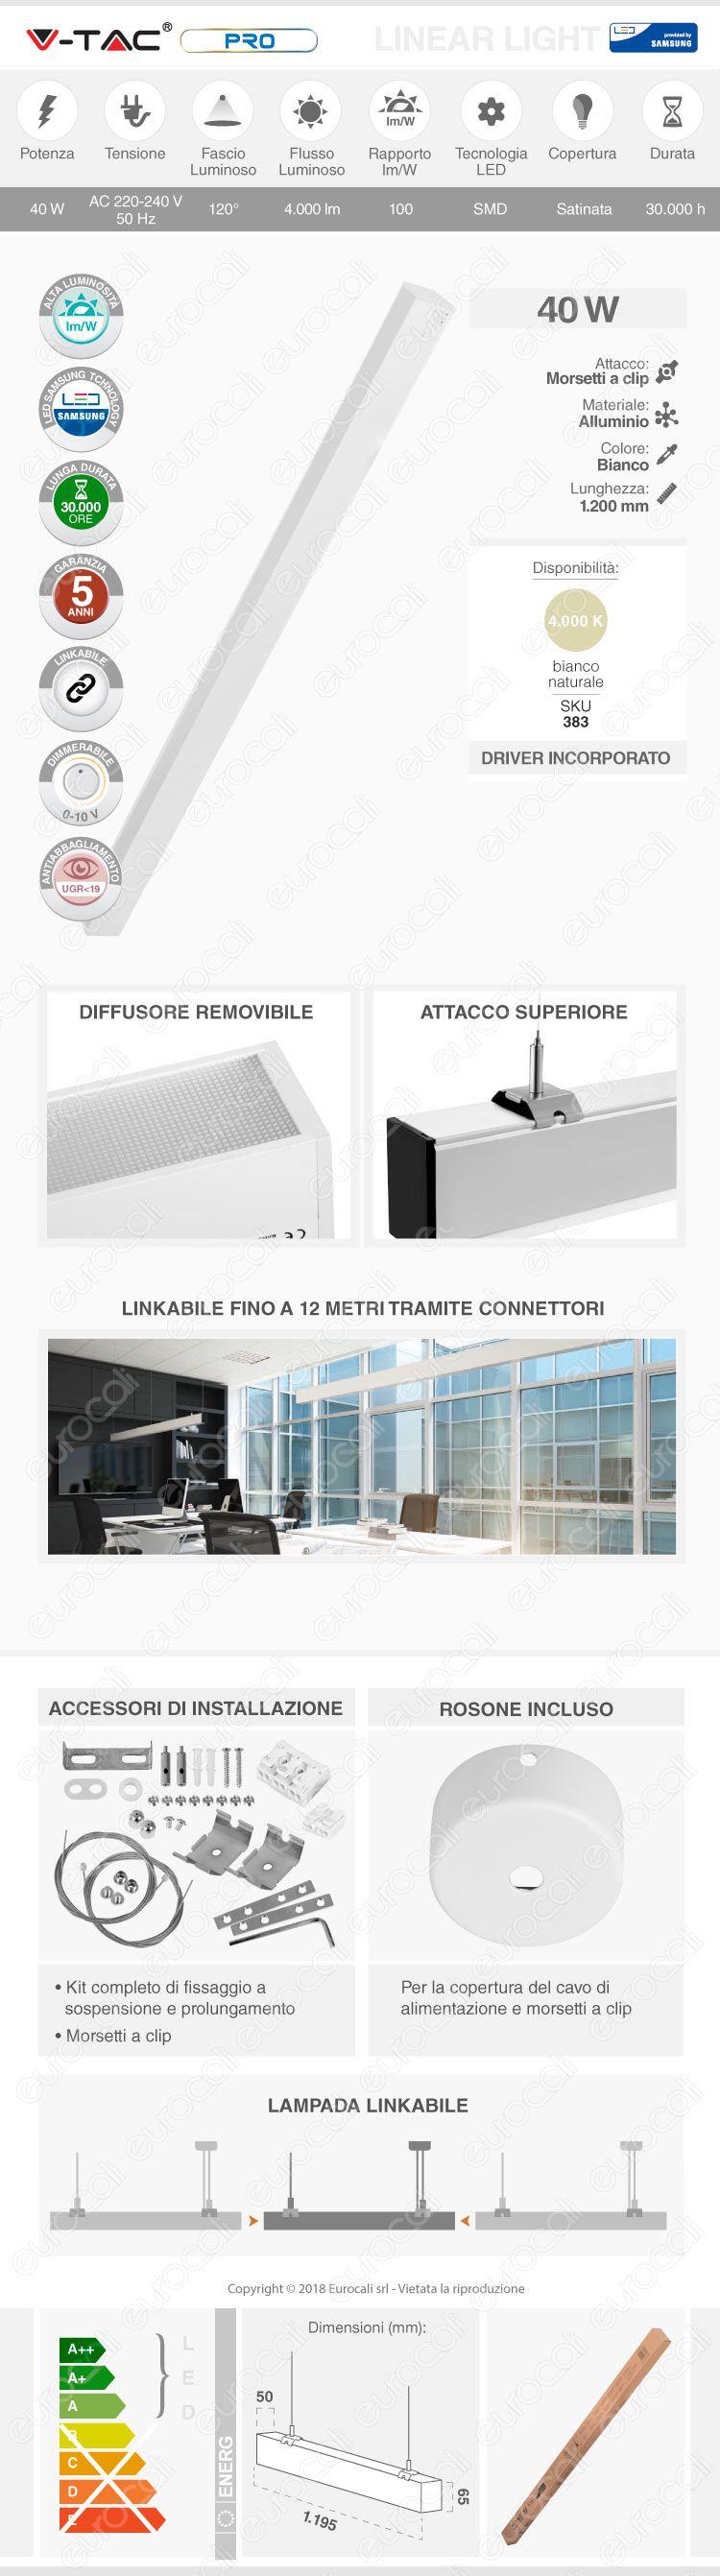 V-Tac PRO VT-7-43 Lampada LED a Sospensione Linear Light 40W Chip Samsung White Body